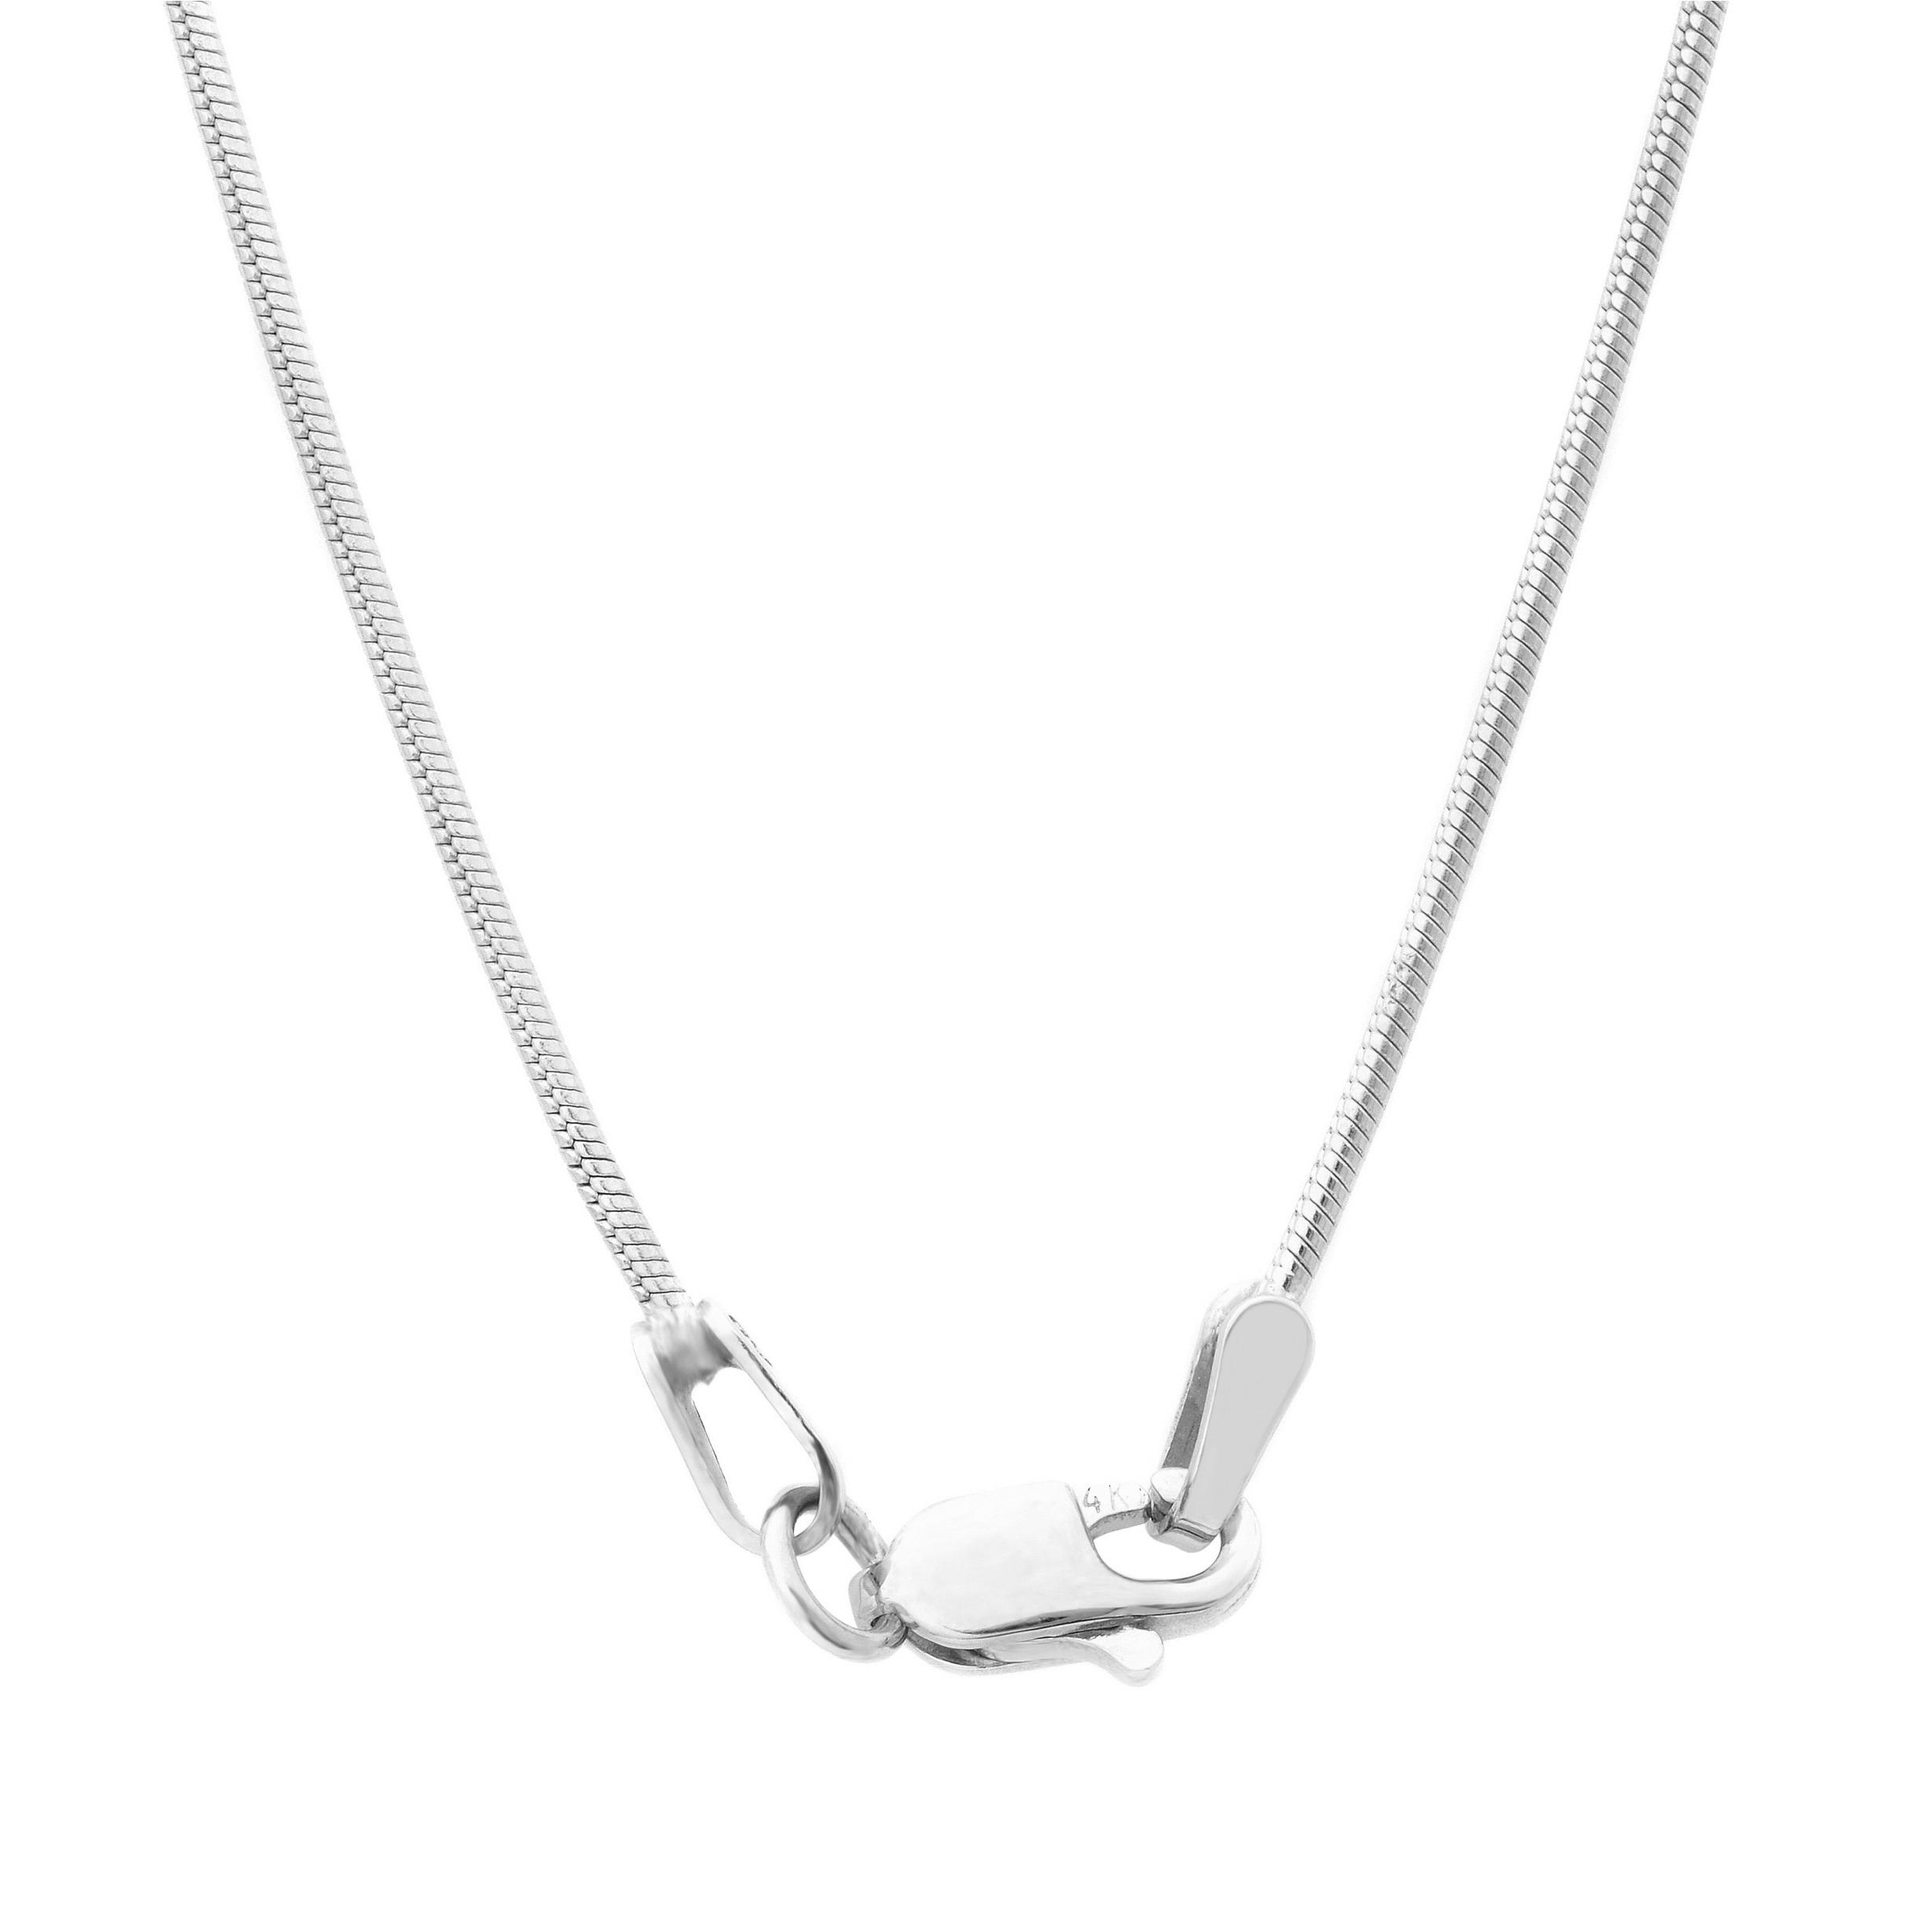 shop roberto martinez 14k white gold diamond cut snake chain Super Weave shop roberto martinez 14k white gold diamond cut snake chain necklace free shipping today overstock 8935792